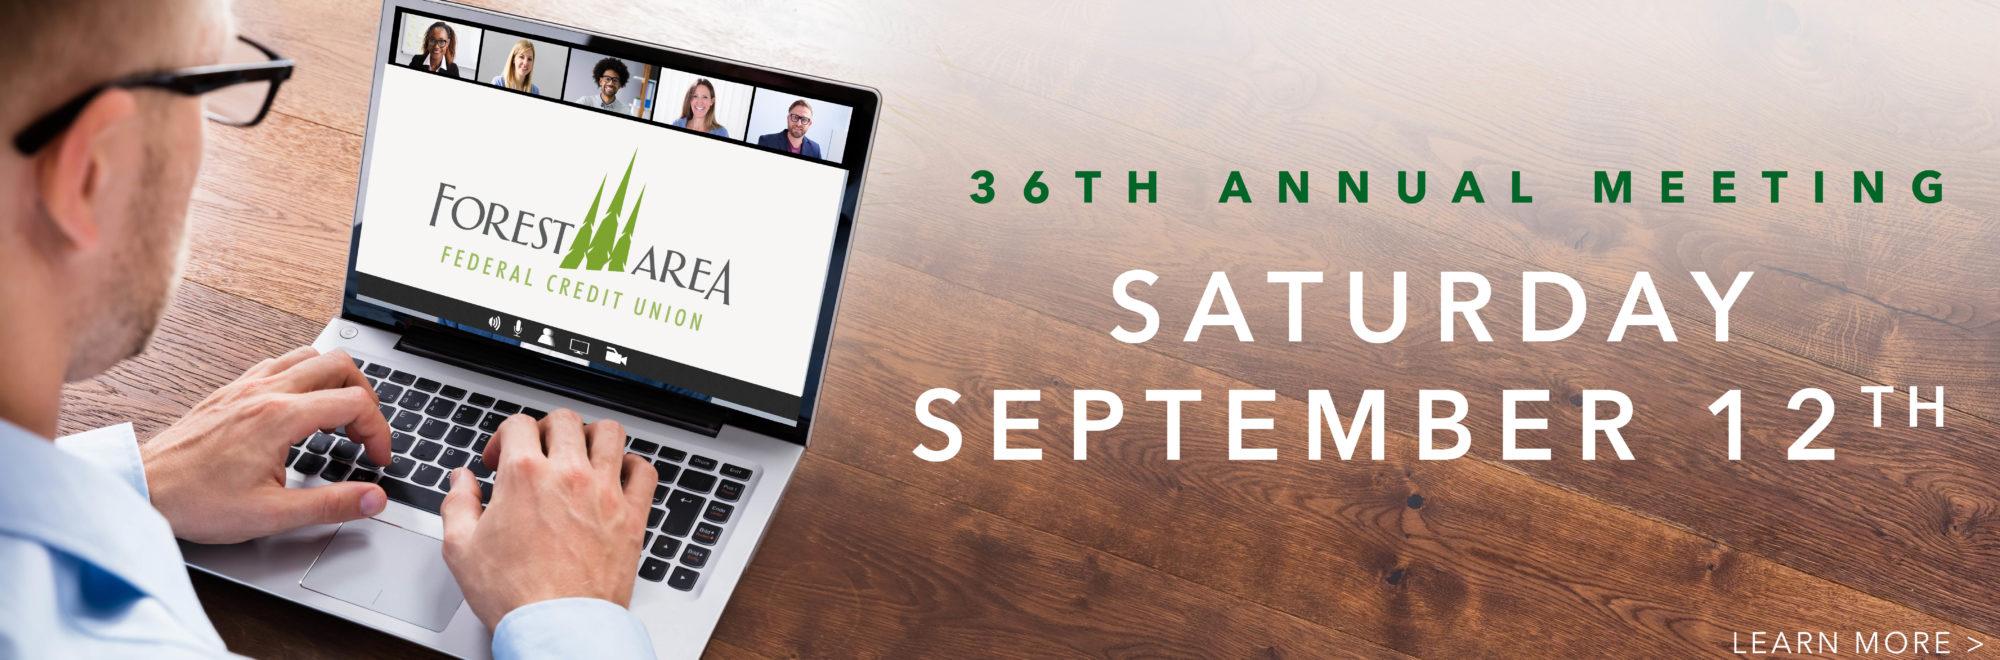 36th Annual Meeting